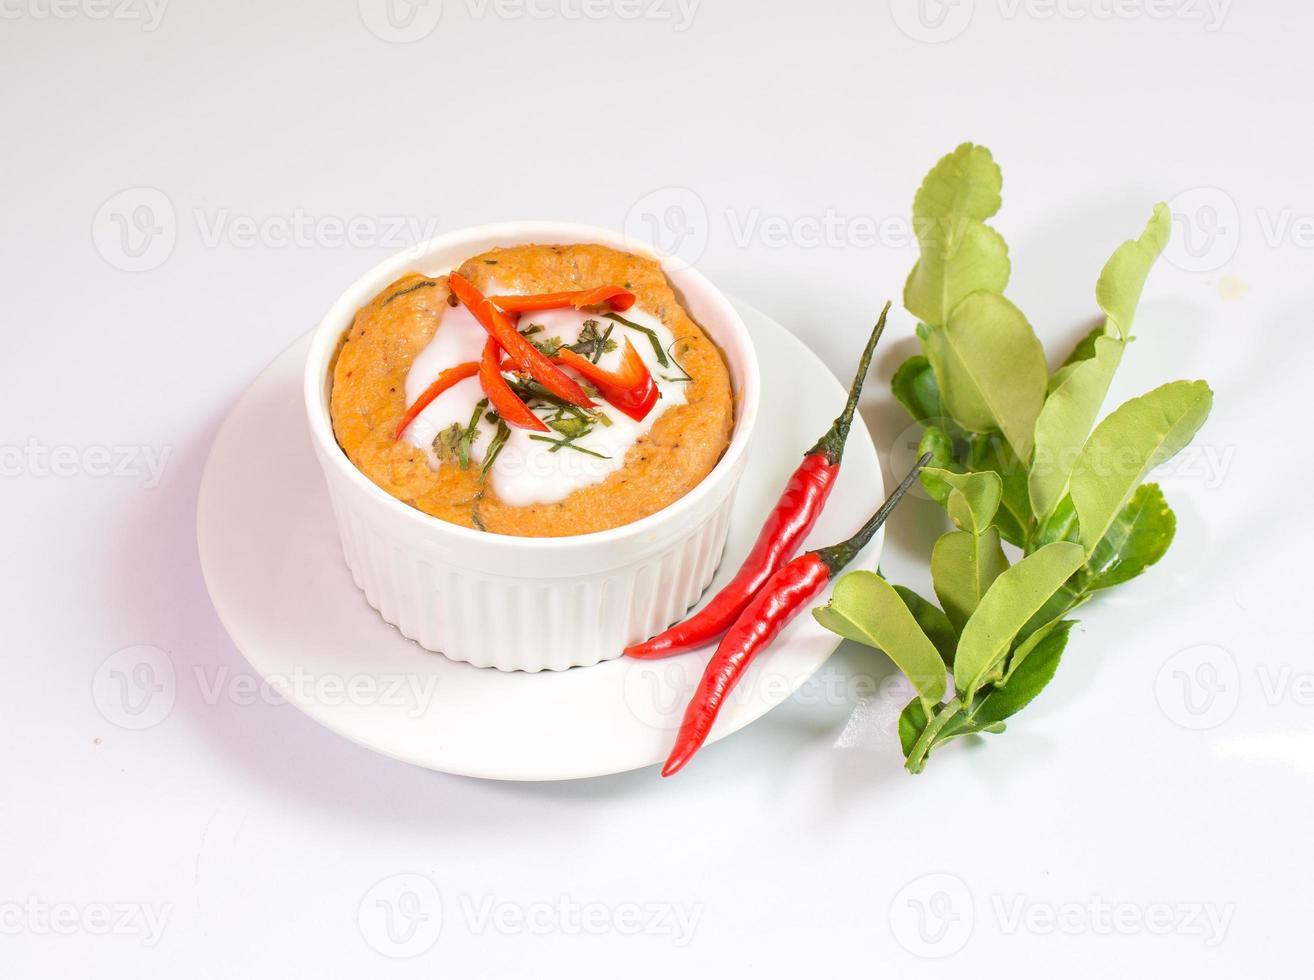 gestoomde vis met currypasta in beker, Thais eten, foto